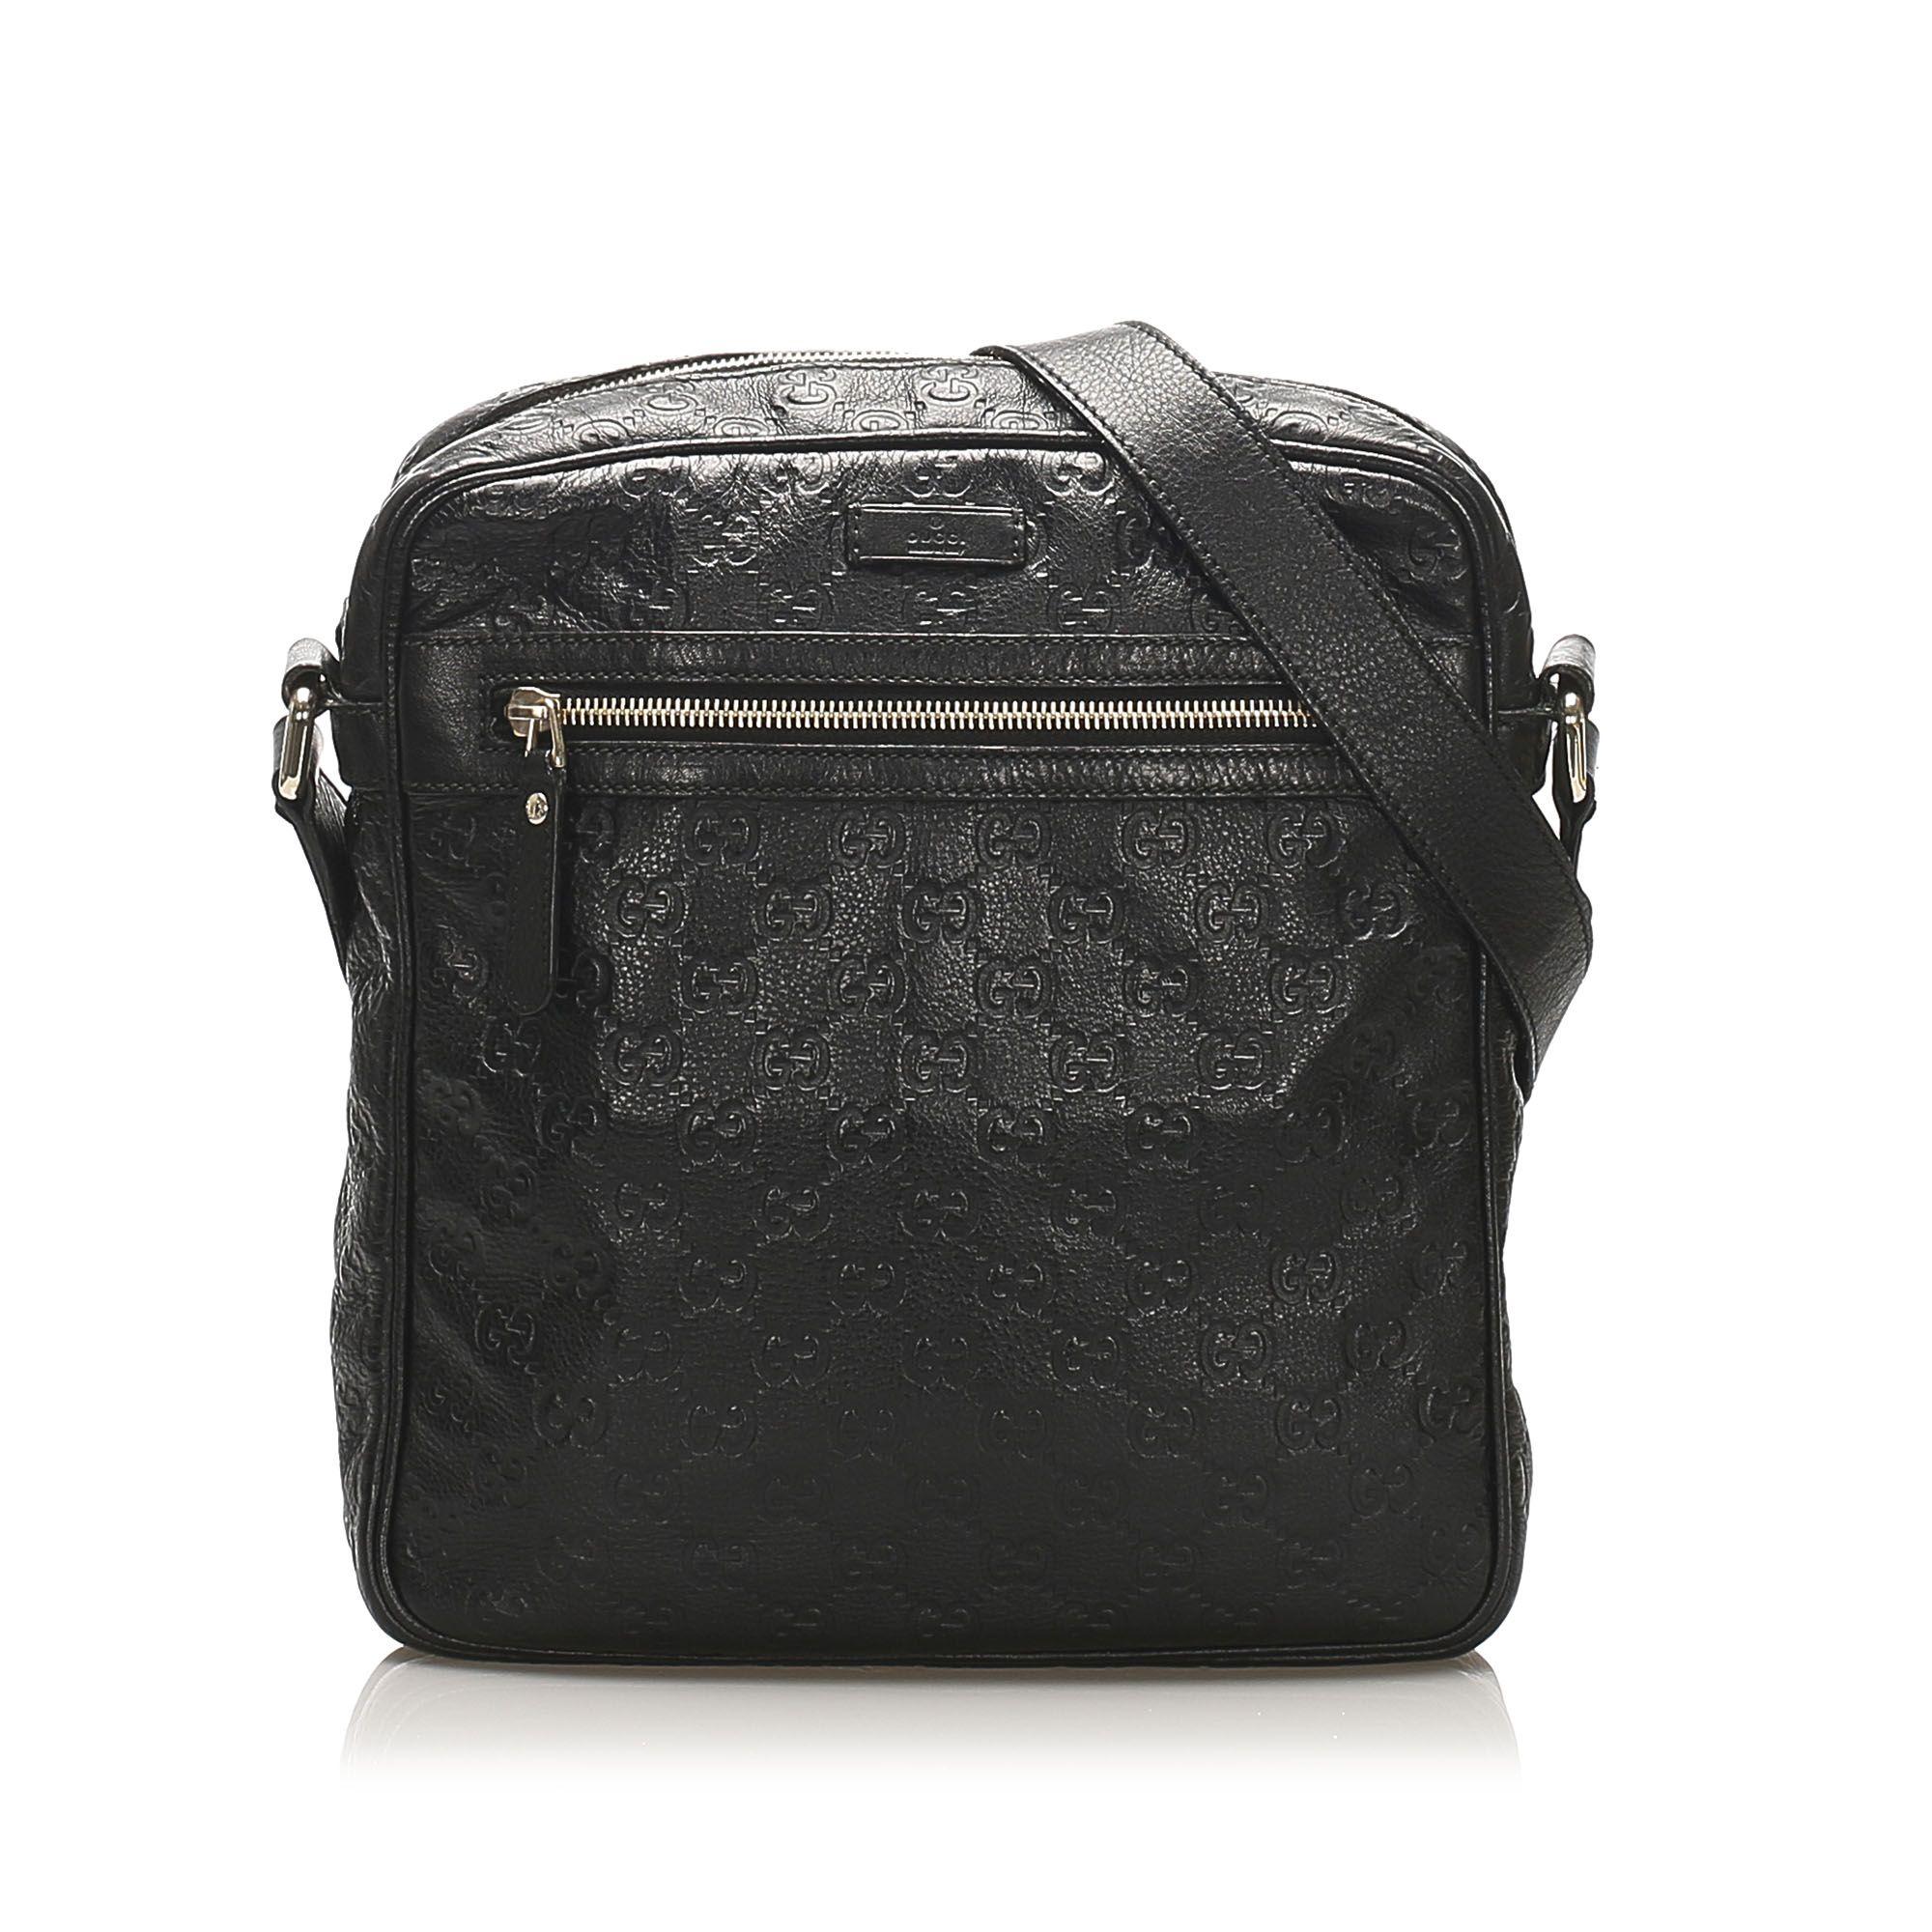 Vintage Gucci Guccissima Crossbody Bag Black